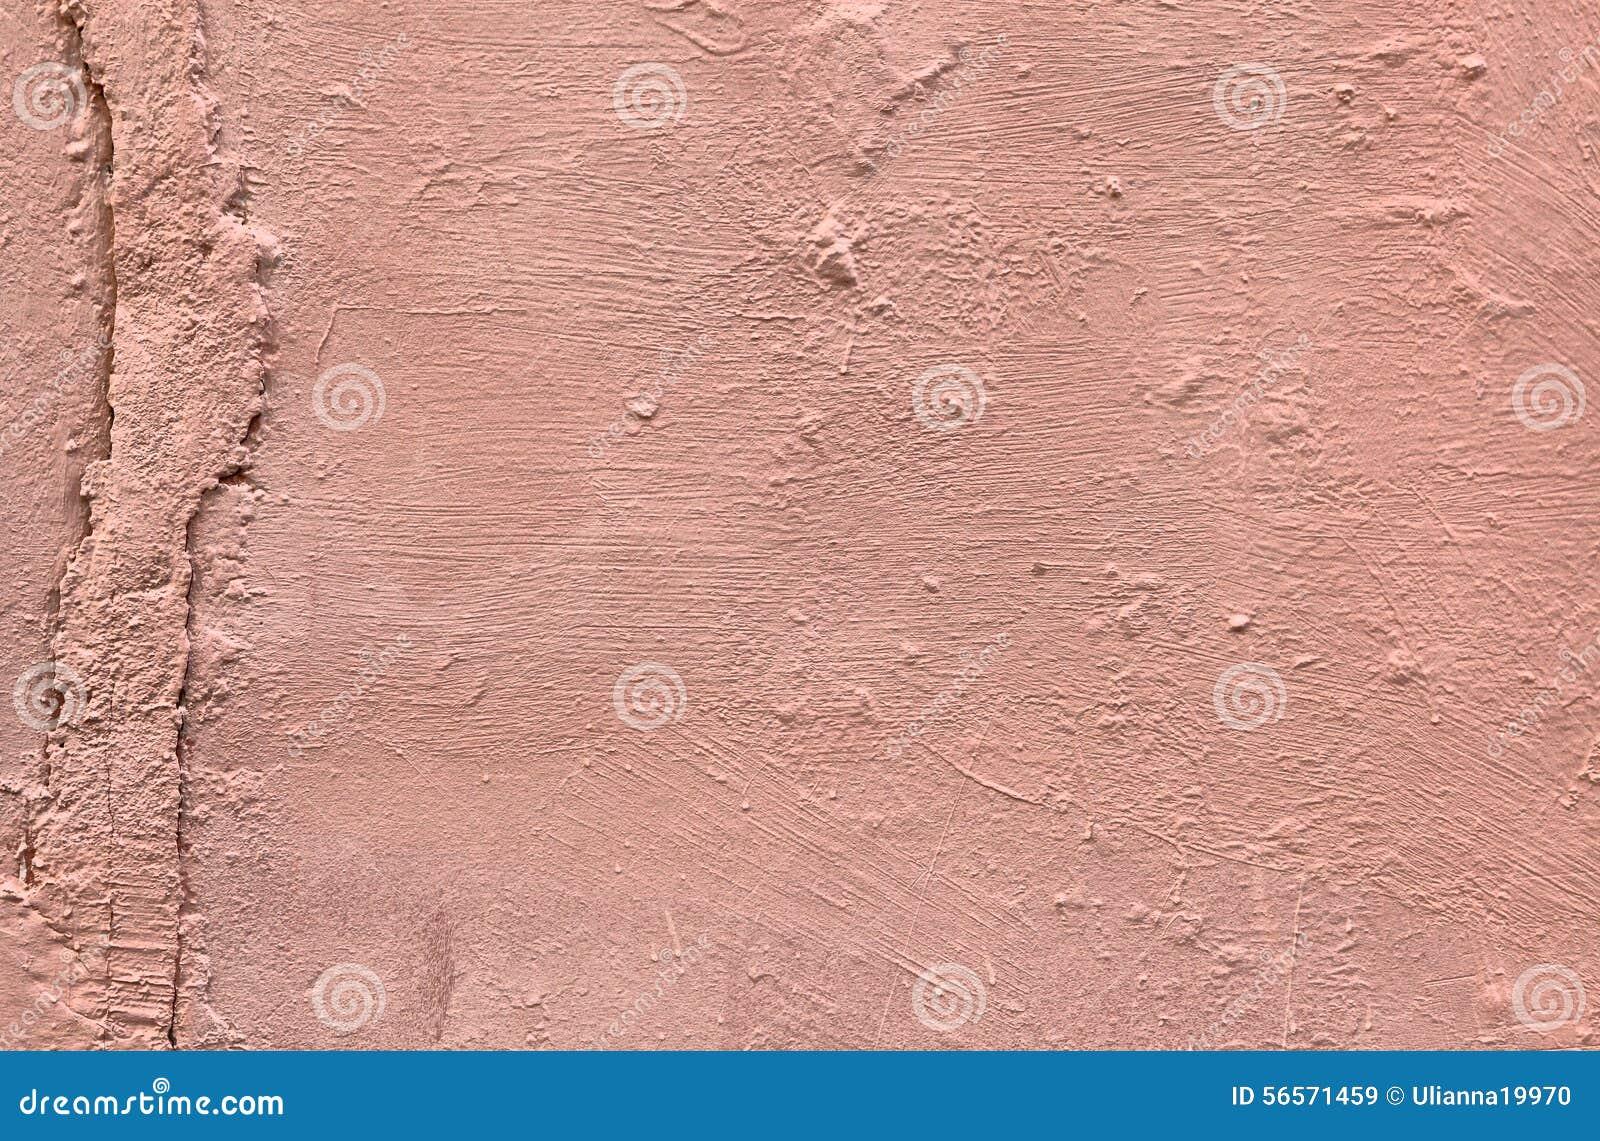 Download Shabby ρόδινος χρωματισμένος Concret τοίχος Στοκ Εικόνα - εικόνα από σκουριασμένος, πρότυπο: 56571459